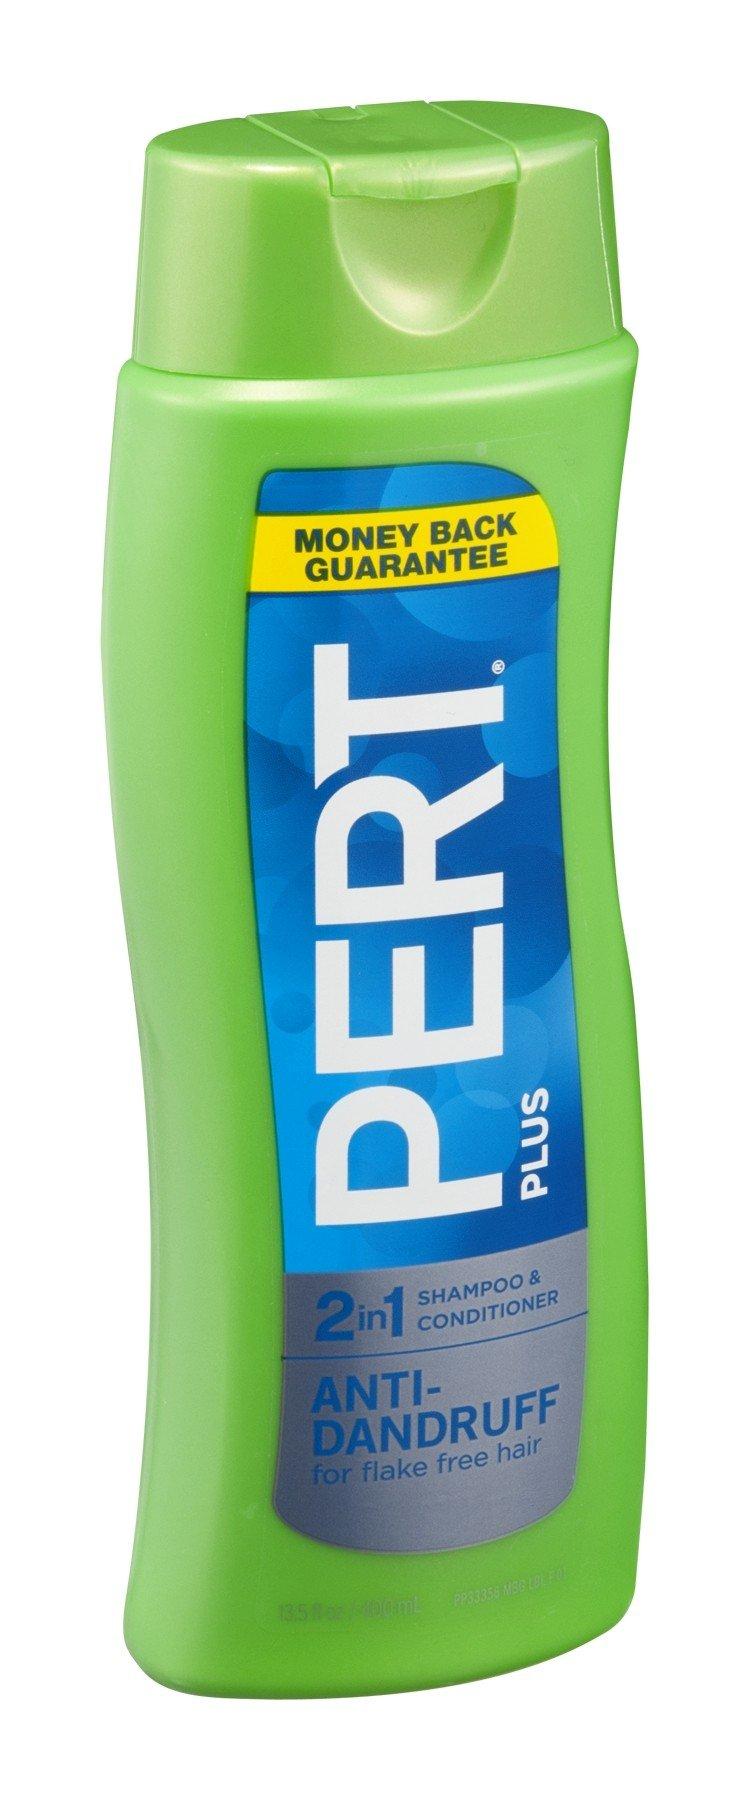 Pert Anti-Dandruff Shampoo 13.5 Oz